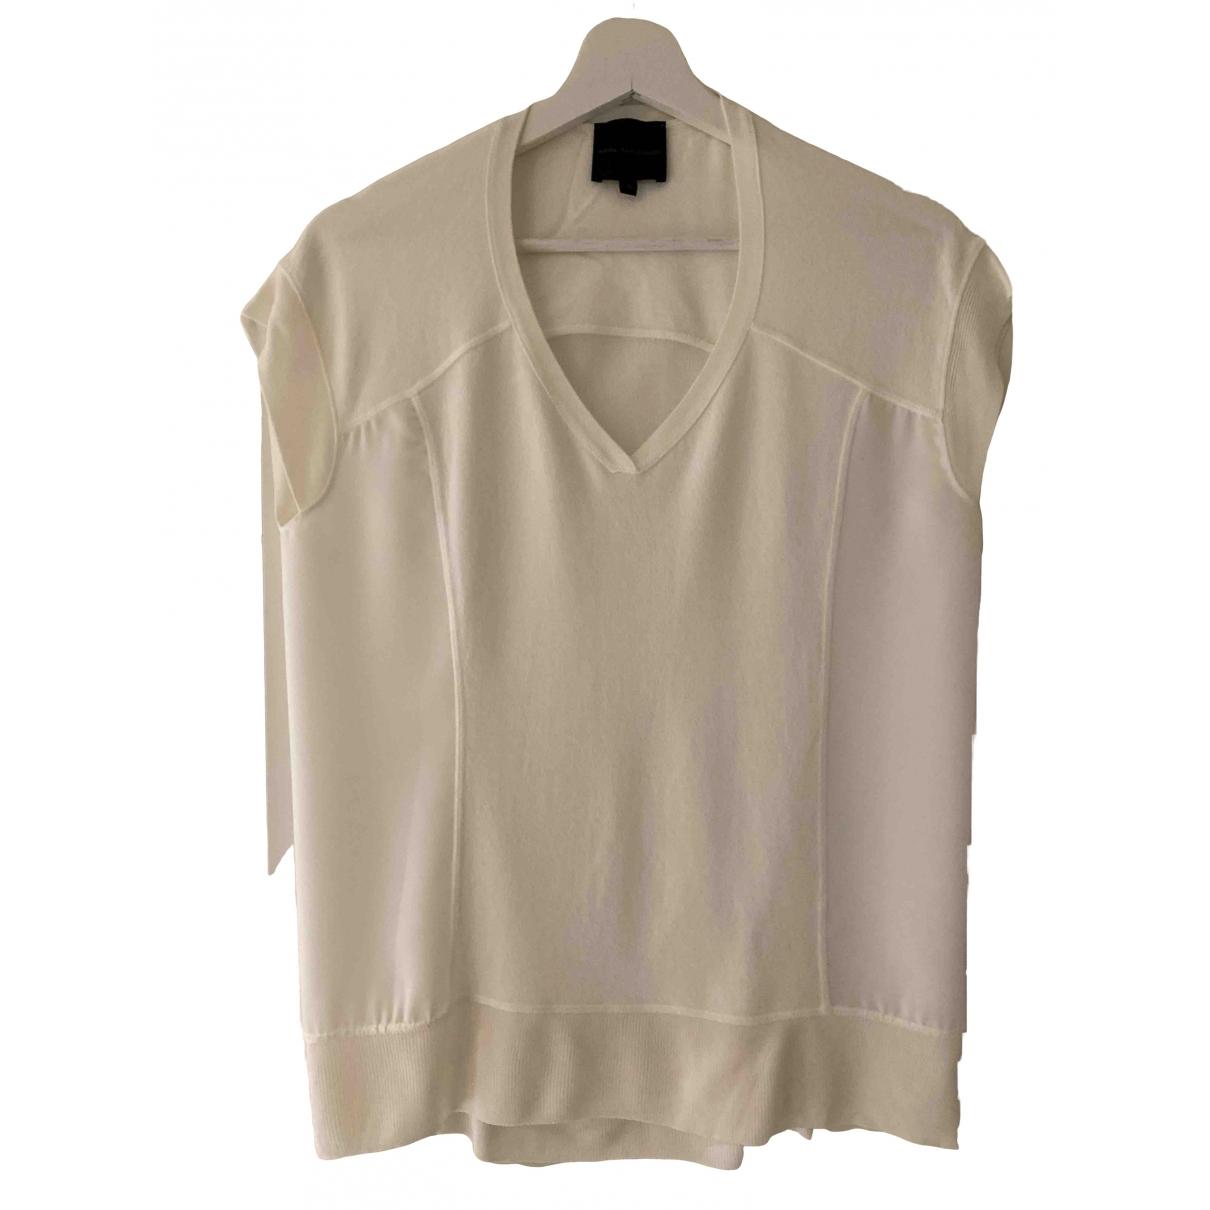 Camiseta sin mangas Hotel Particulier